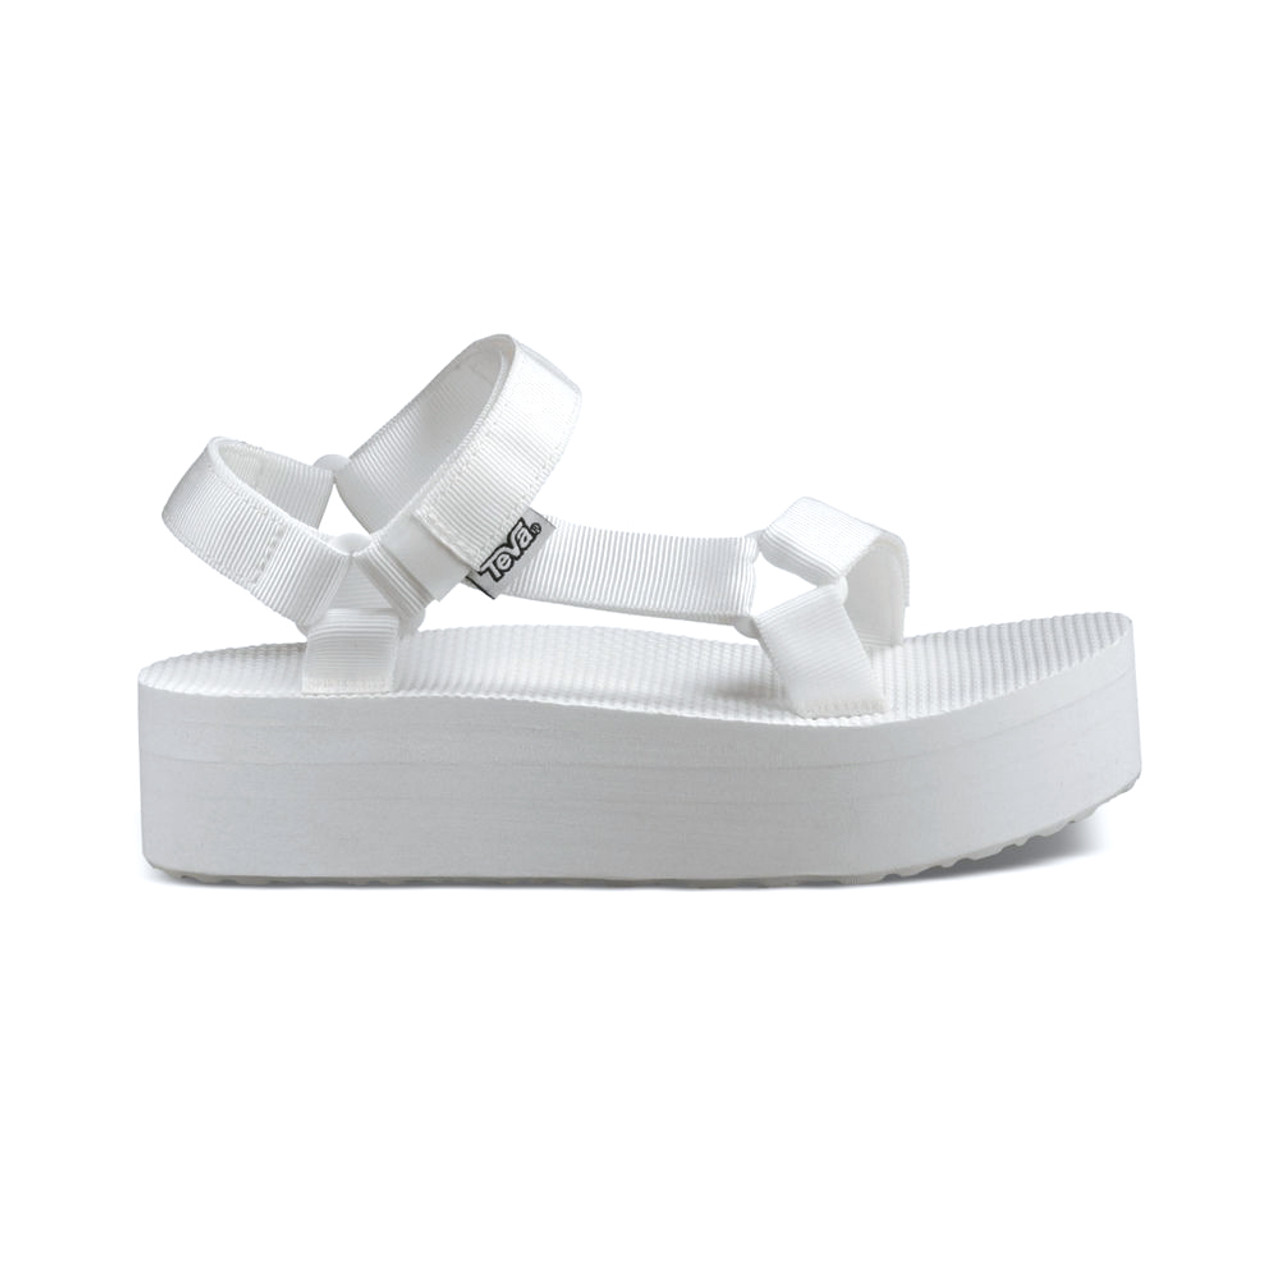 cbc5c3a14d7e Teva Women s Flatform Universal Platform Sandal Bright White - Shop now    Shoolu.com